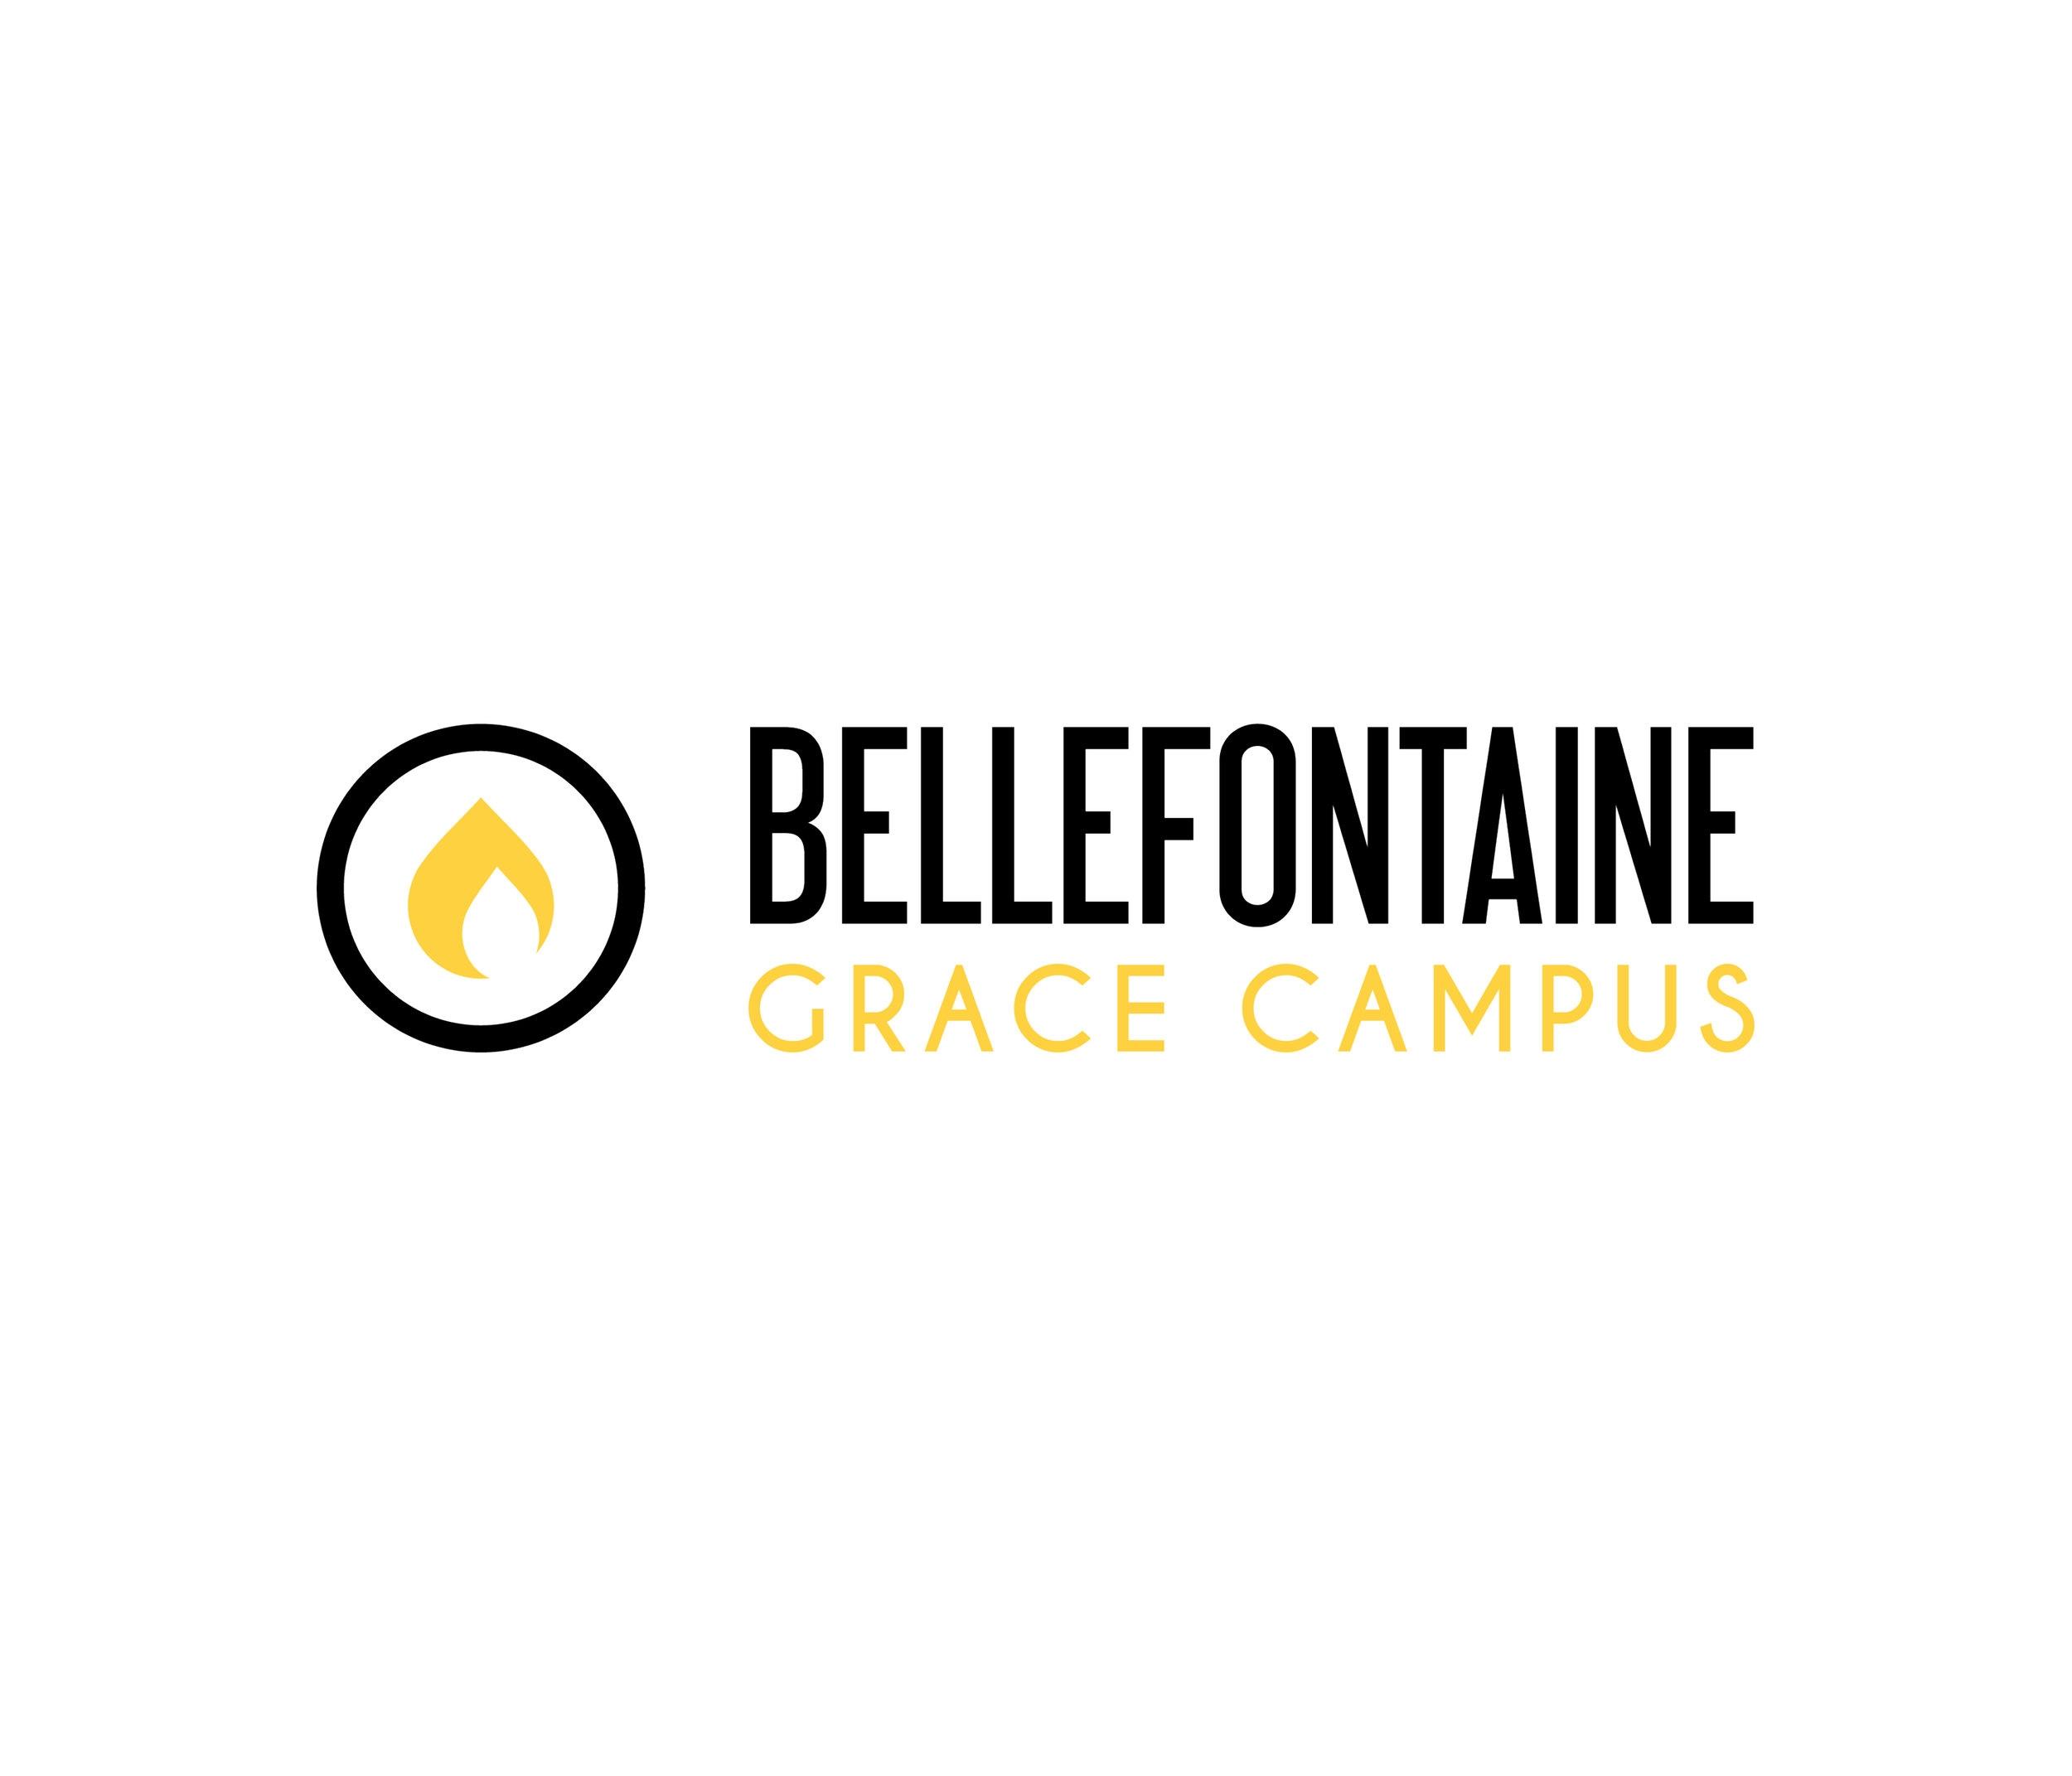 Bellefontaine Grace Campus Logomark